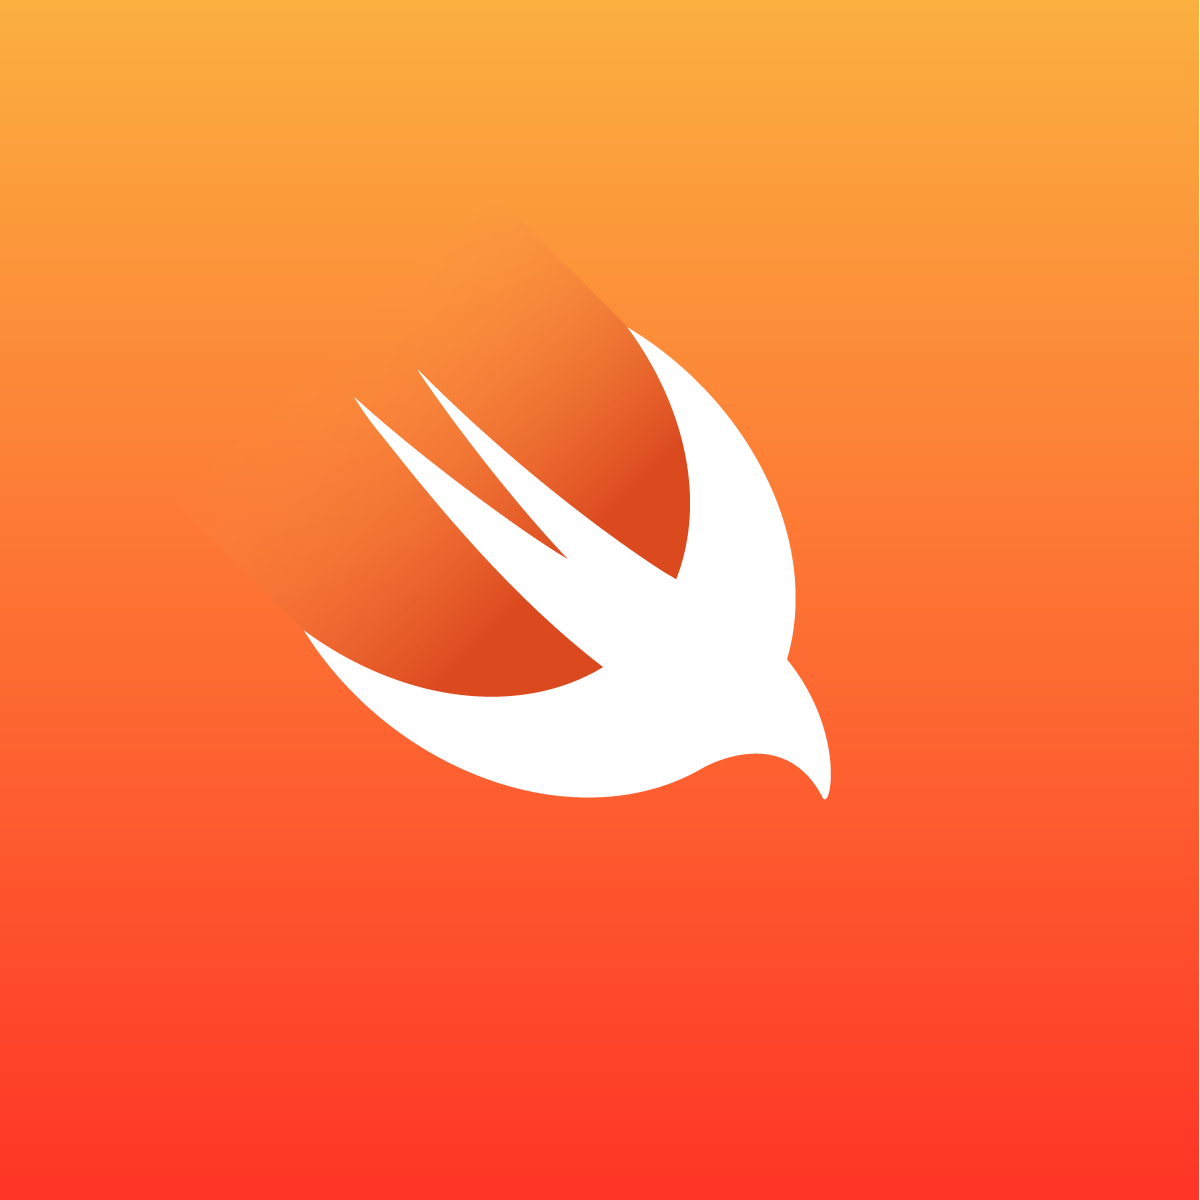 IBM and Apple move swiftlyto leverage Swift